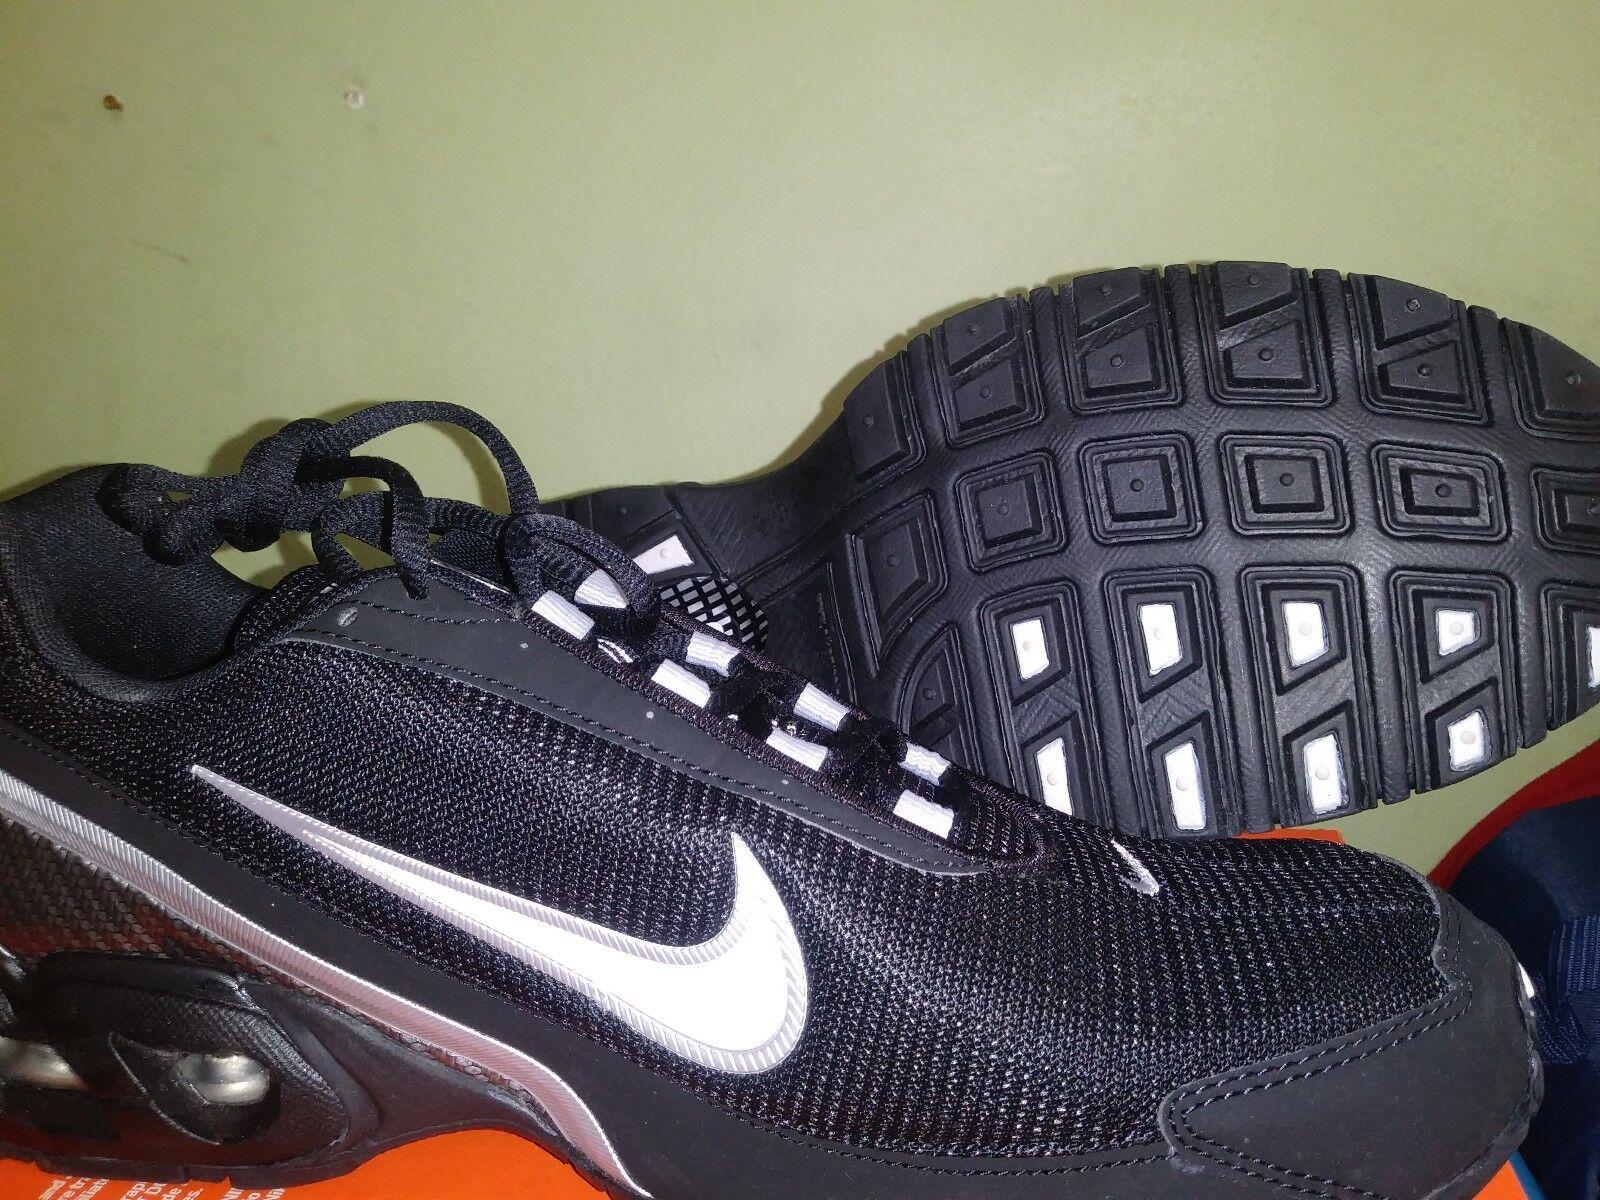 0f1bb4954ef9d6 Nike Air Max Torch 3 Mens Running Shoes Black Silver Carbon White ...